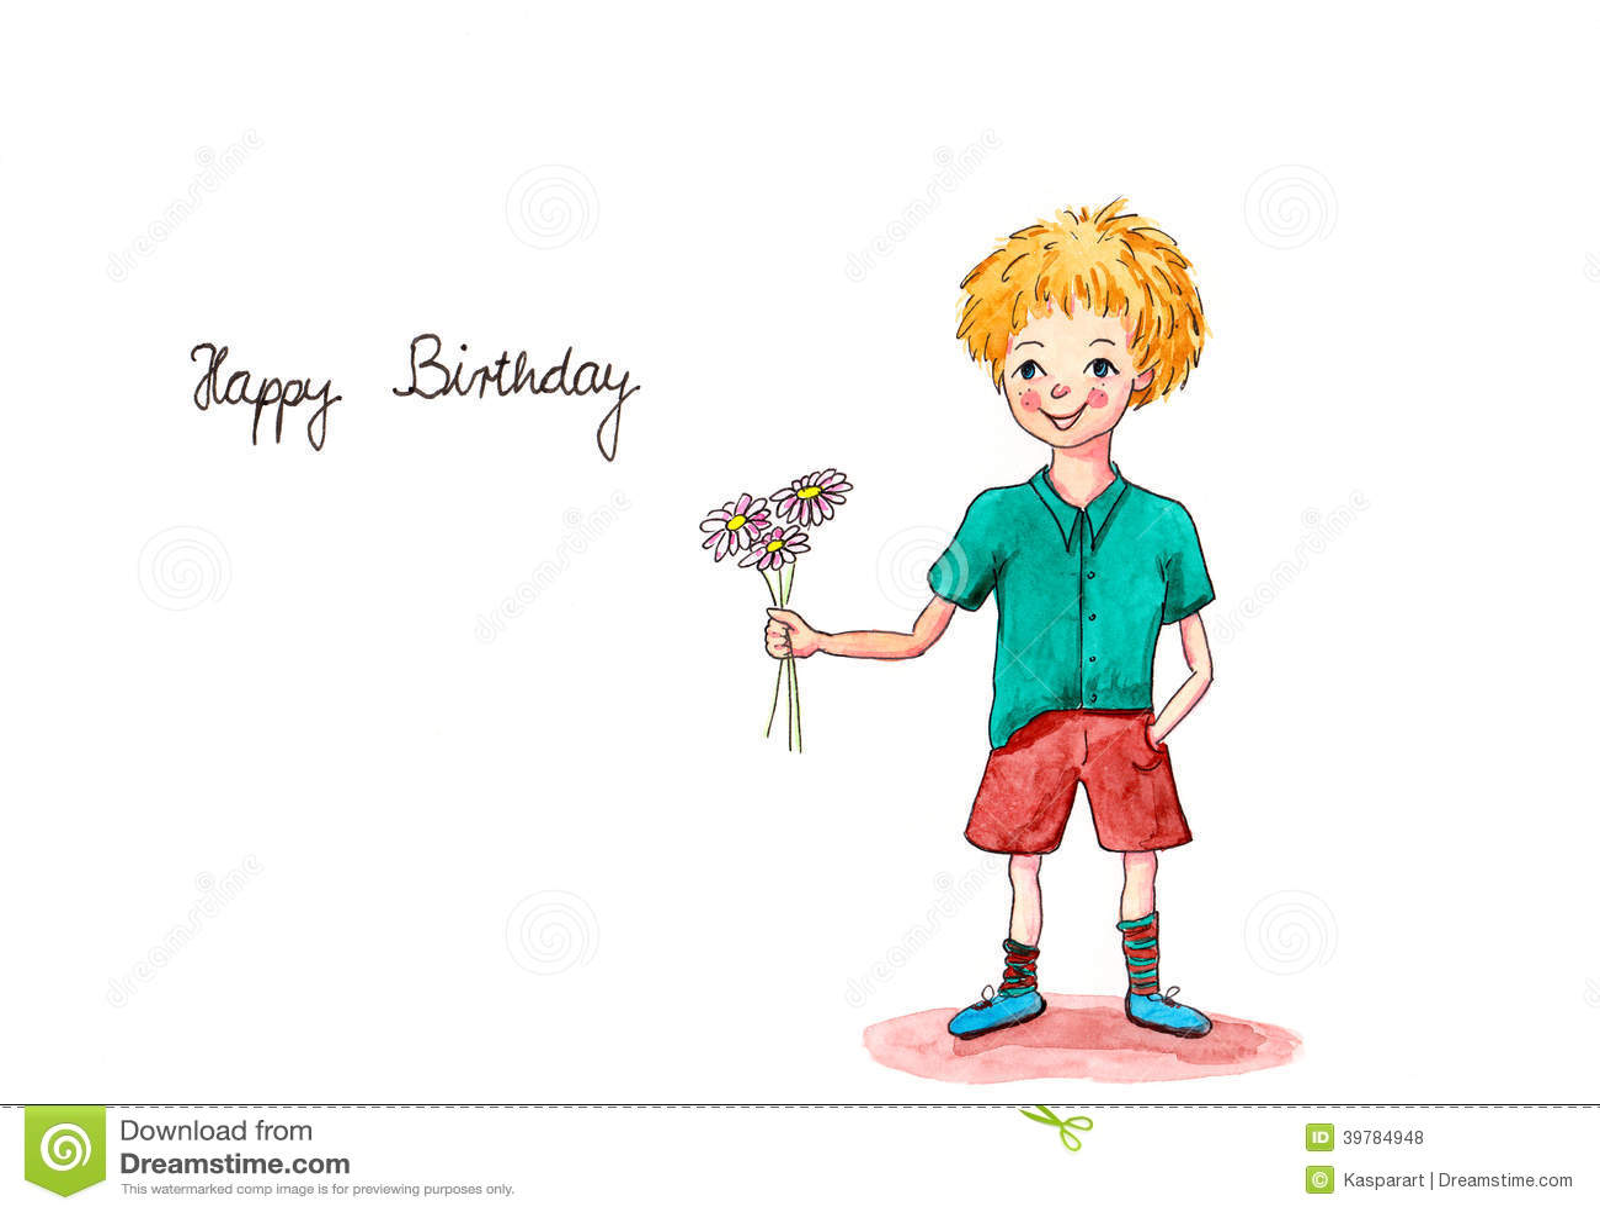 Birthday Boy Watercolor Greeting Card Illustration Image – Text Birthday Card